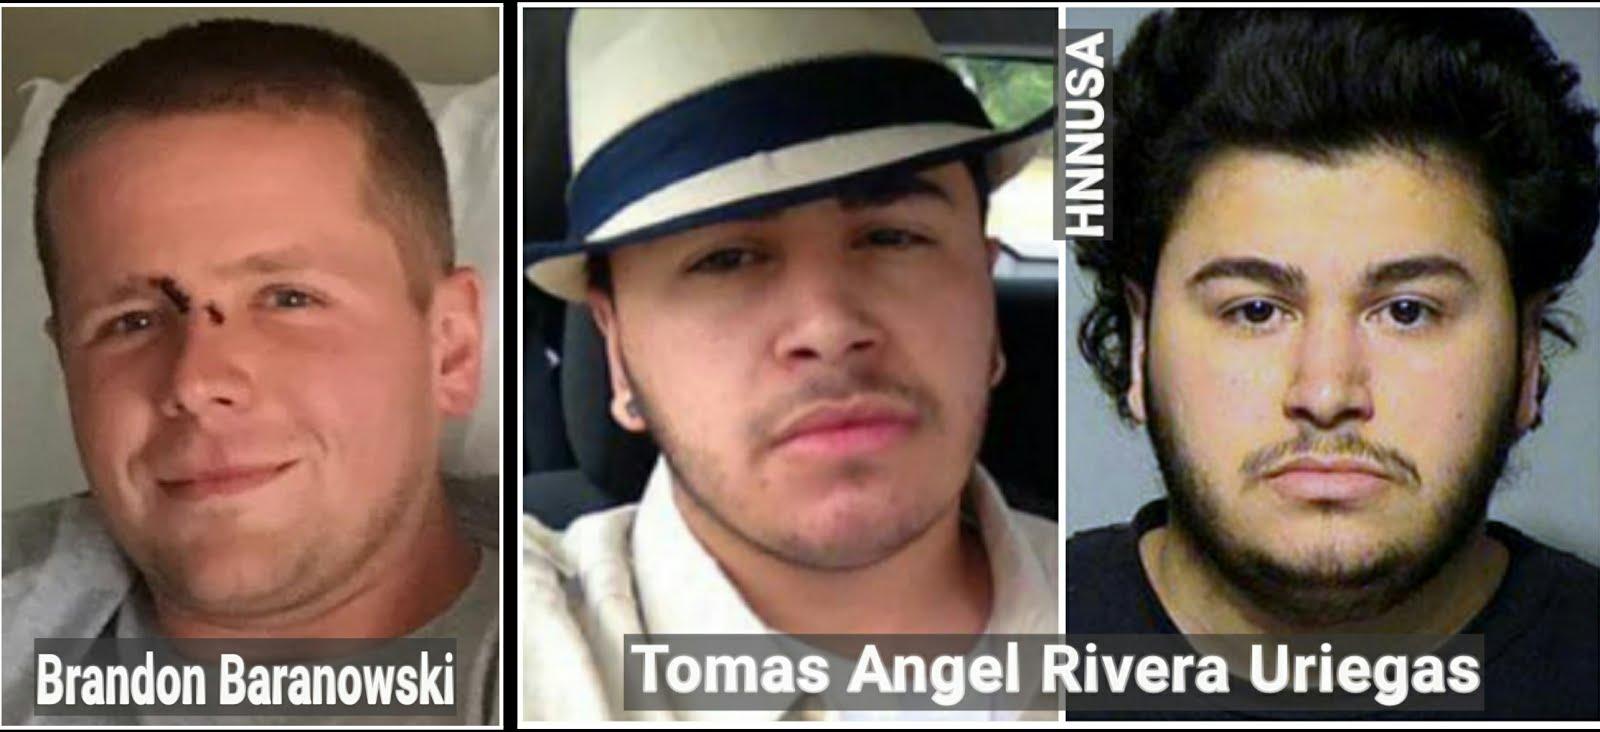 Allis Suicide hispanic news network u.s.a.: 31-year-old milwaukee cop shot